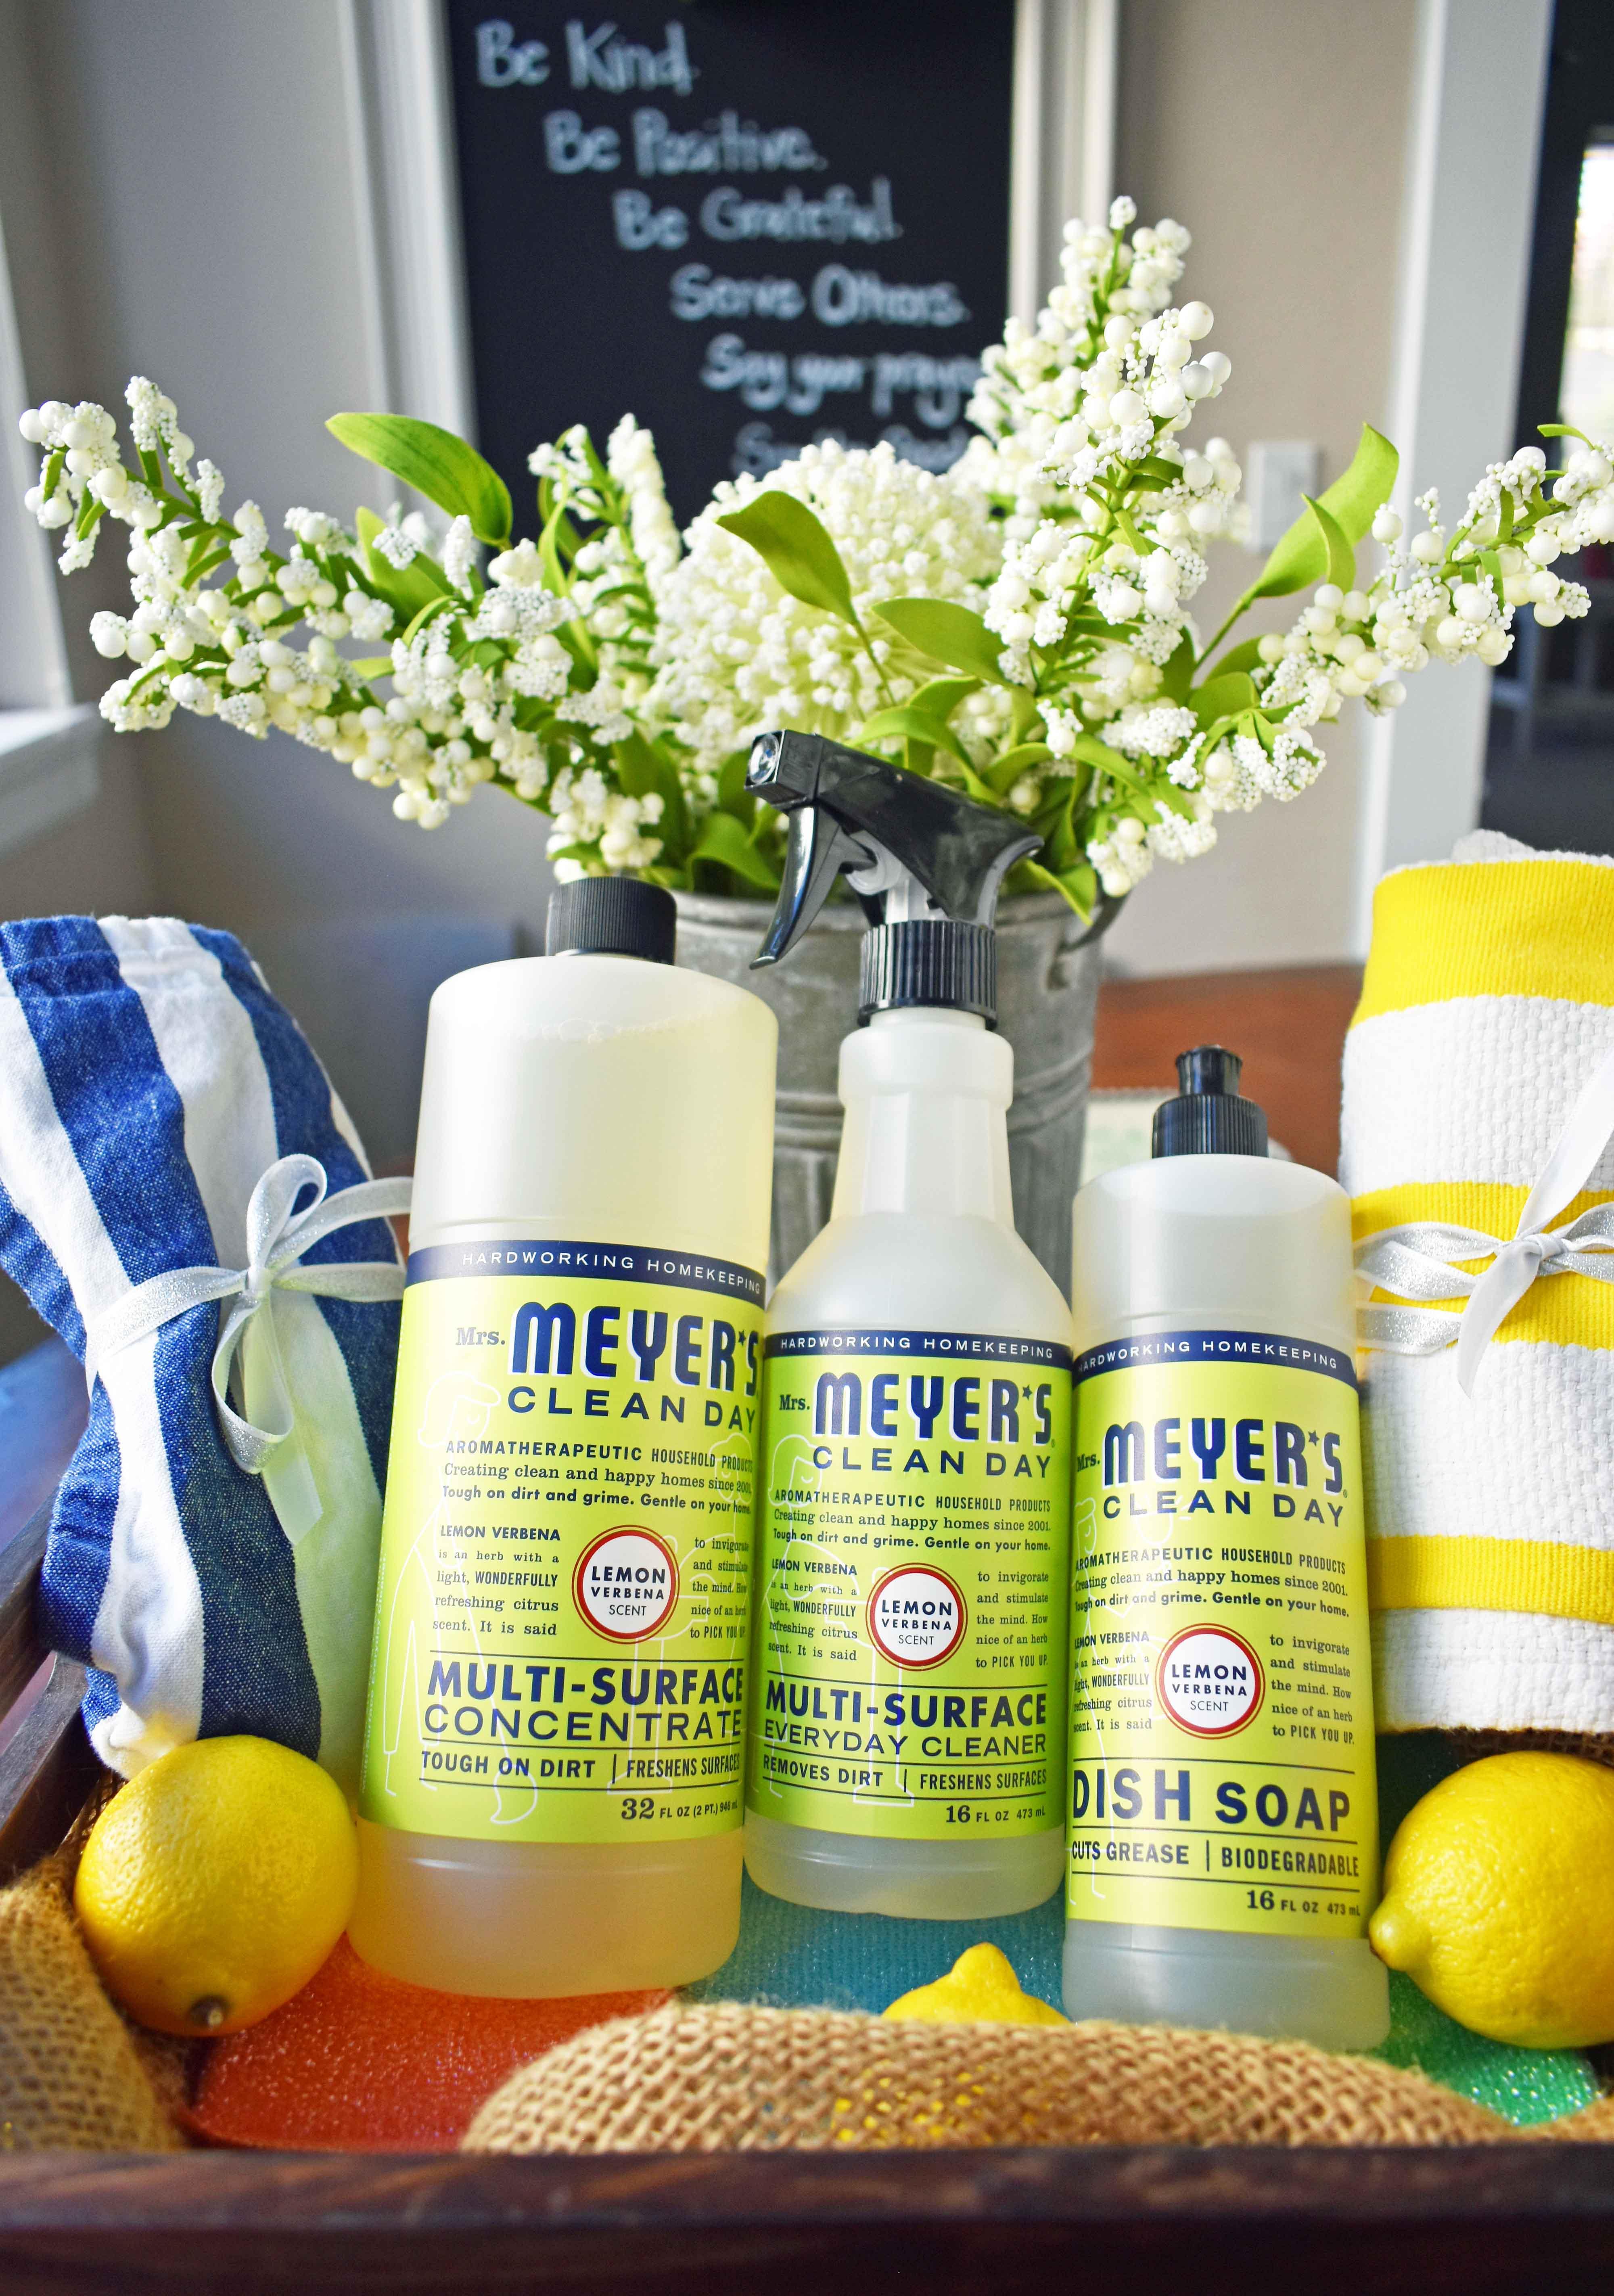 The Perfect Housewarming Basket. A basket full of Mrs. Meyer's Lemon Verbena Multi-Surface Everyday Cleaner, Mrs. Meyer's Dish Soap, striped dish towels, colorful sponges, fresh lemons and a vibrant tablecloth. www.modernhoney.com